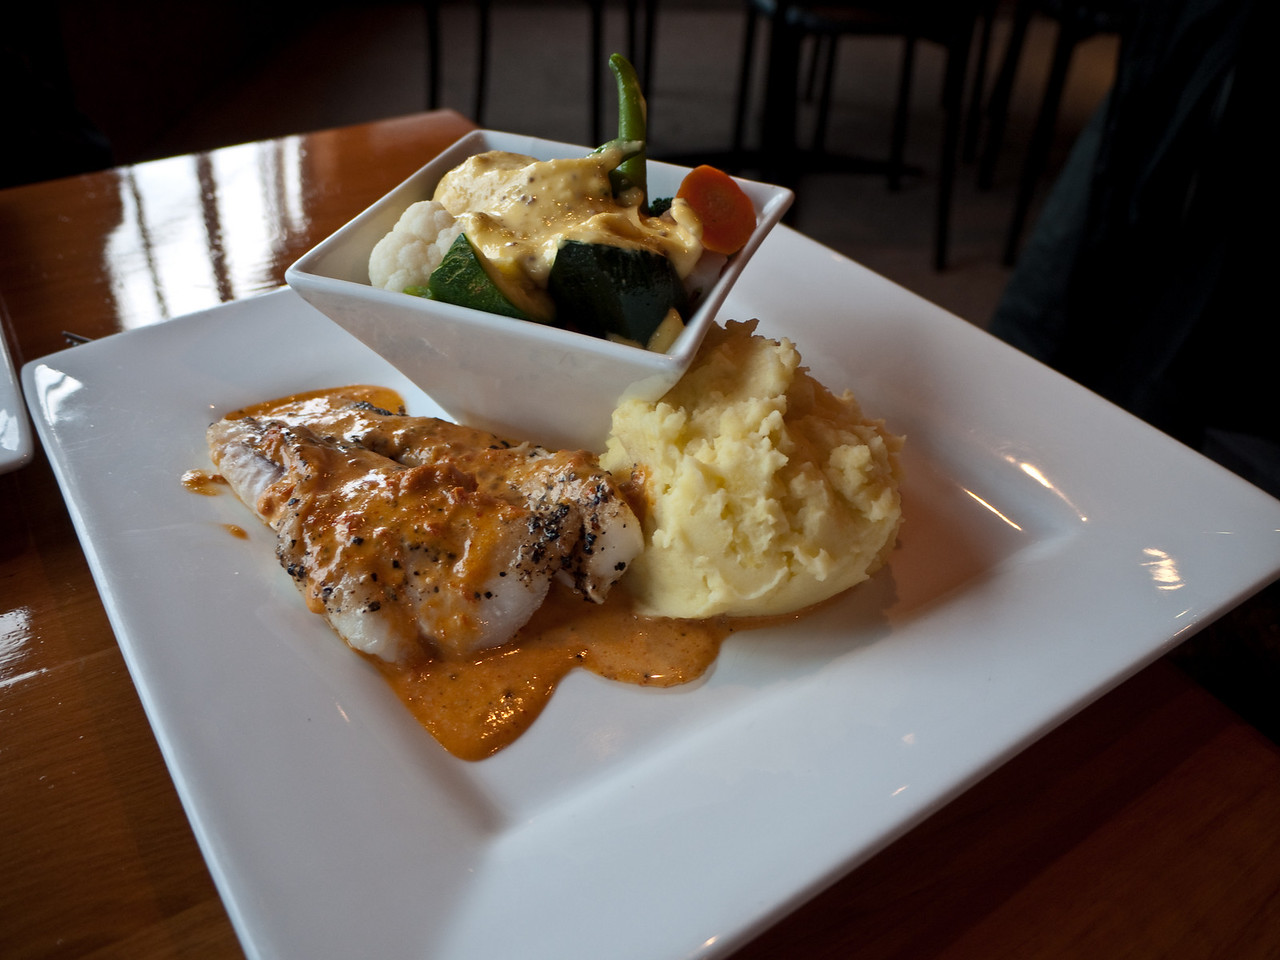 Monkfish and vegetables from the Lobster Inn Tavern, Kaikoura